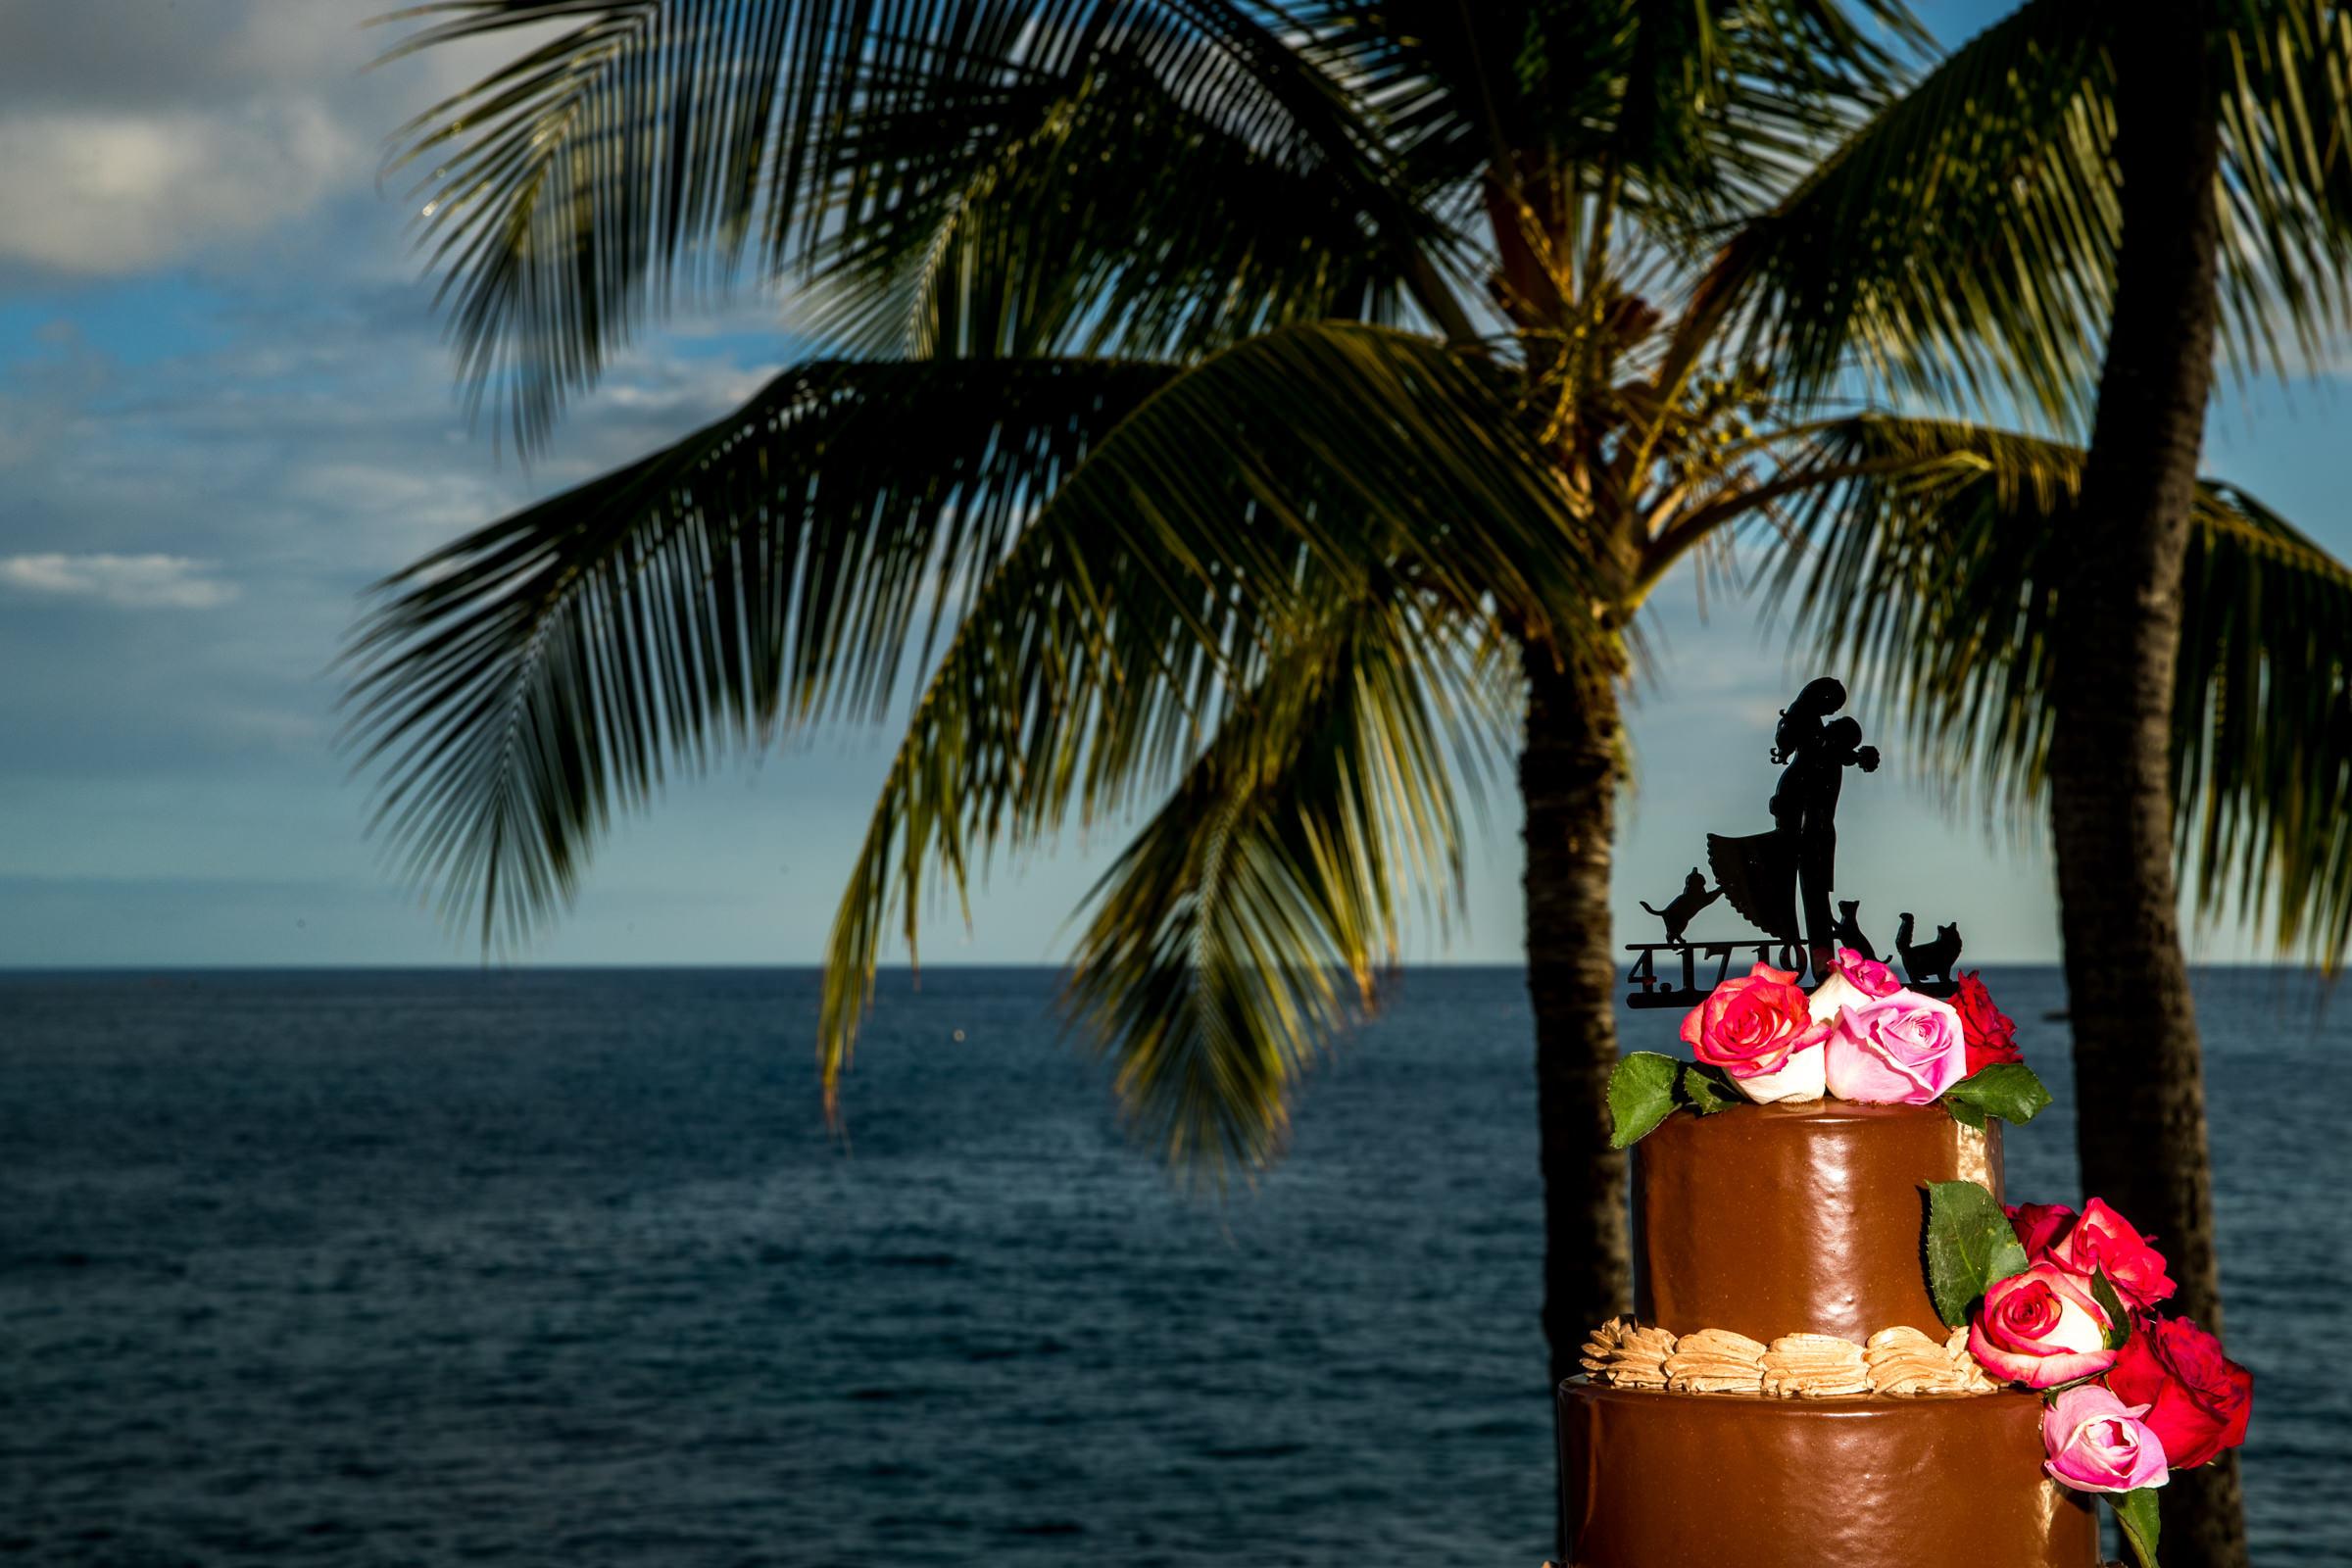 wedding-photographer-photography-destination-hawaii-lake-tahoe-details-cake